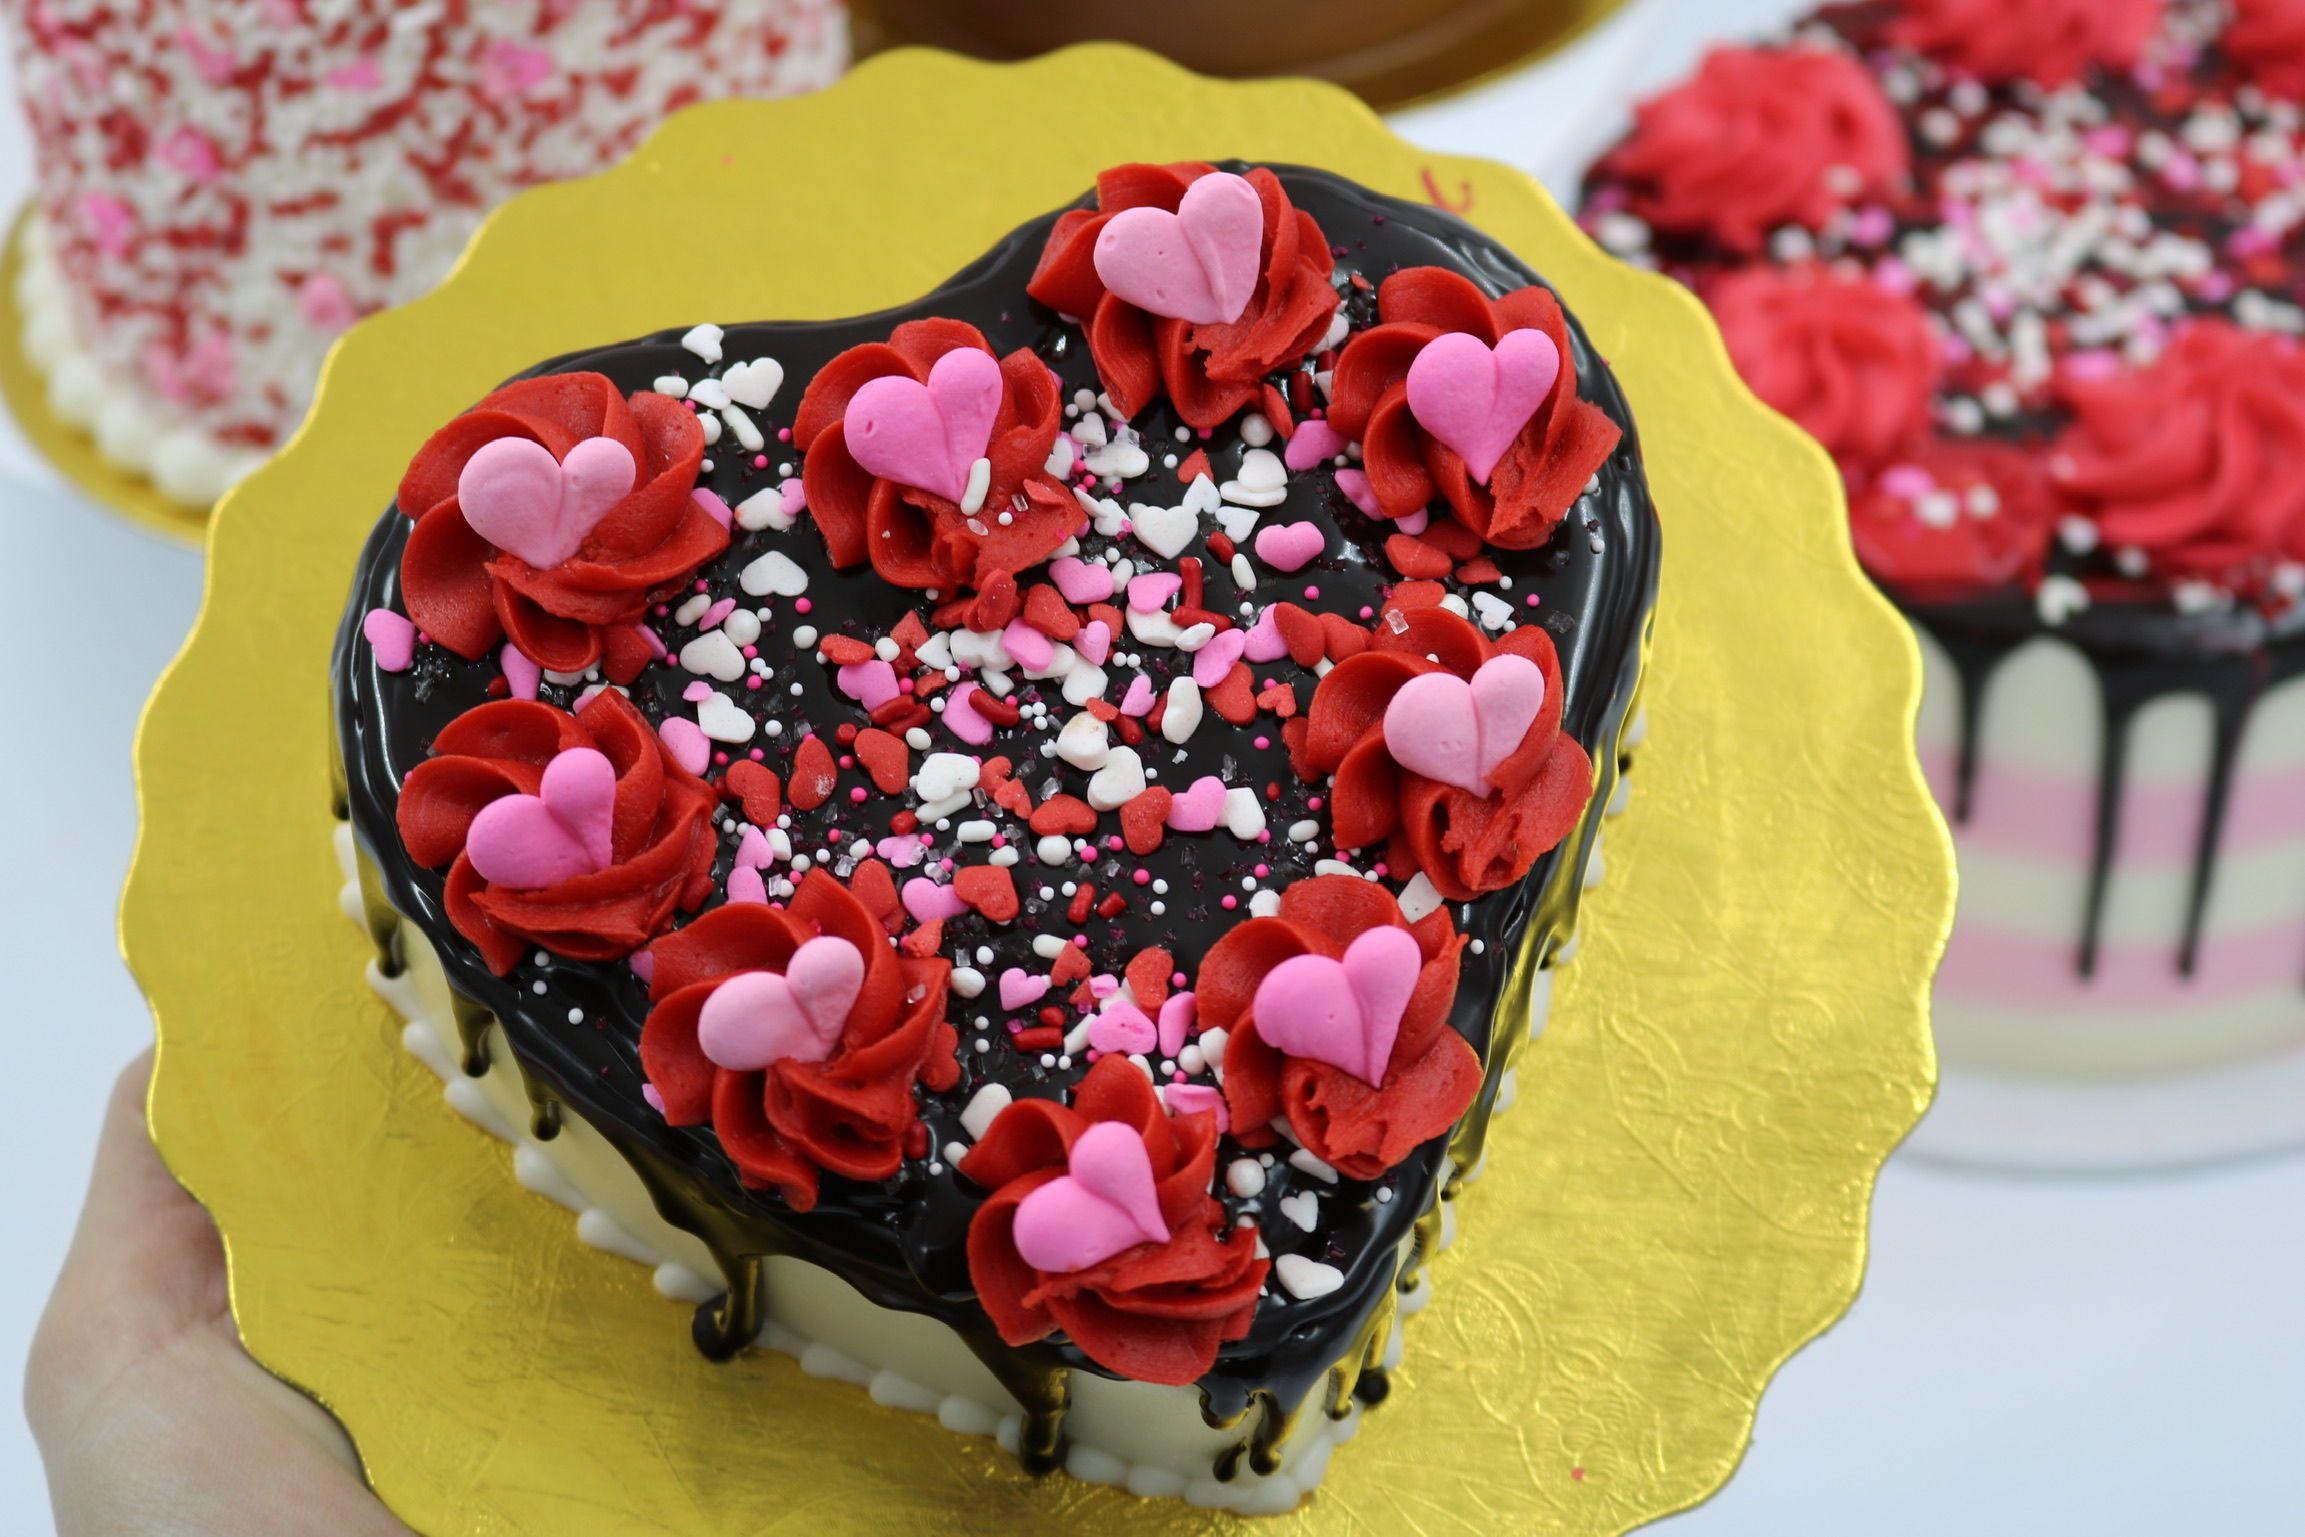 Valentine Chocolate Ganache Drip Cake Heart Shaped By 3 Sweet Girls Cakery Cake Chocolate Ganache Drip Cake Valentines Day Cookies